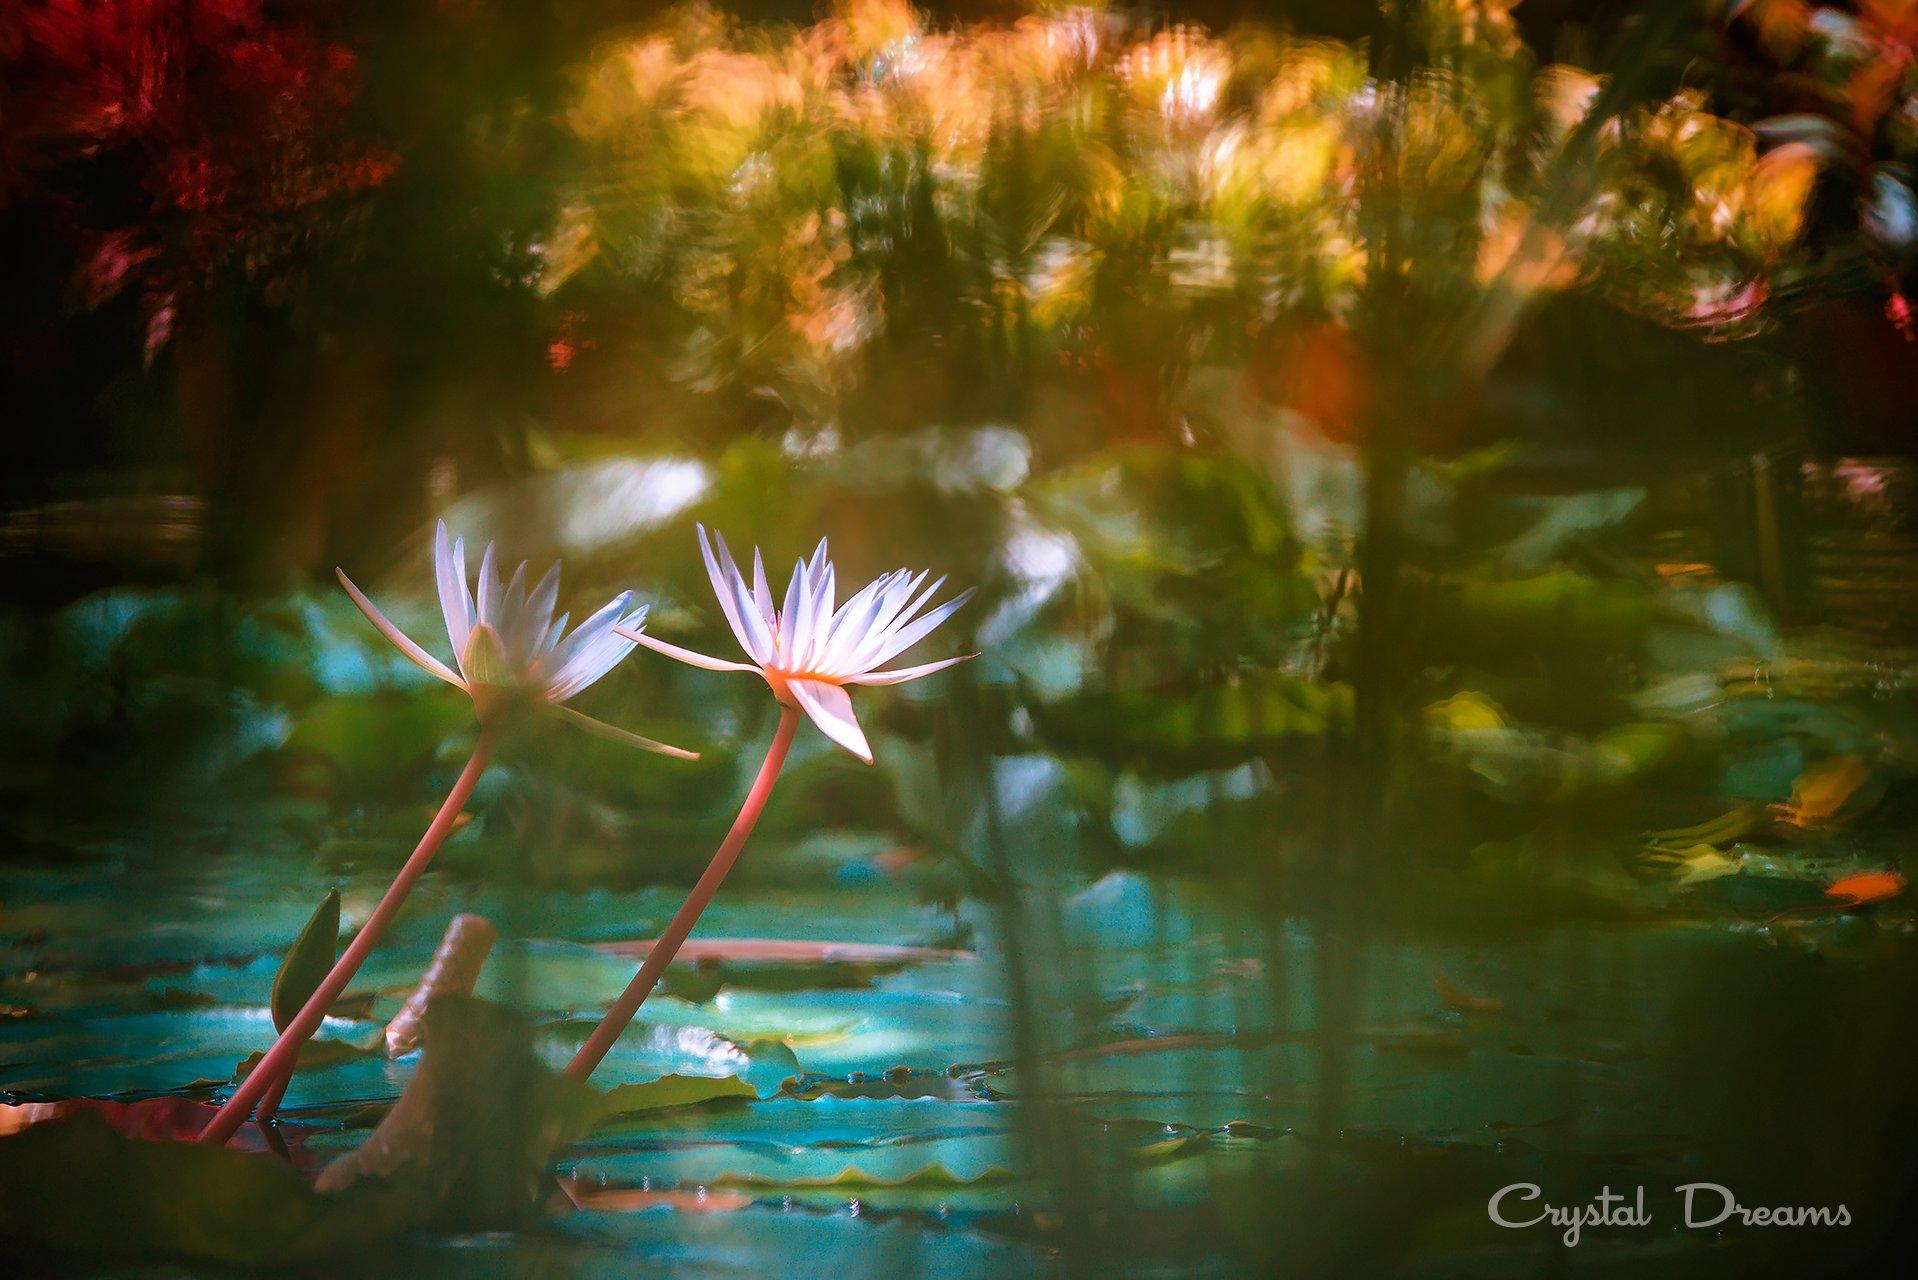 """Impressionism in the botanical, Art, Bokeh, Color, Crystal Deams, Nature, Крылова Татьяна"